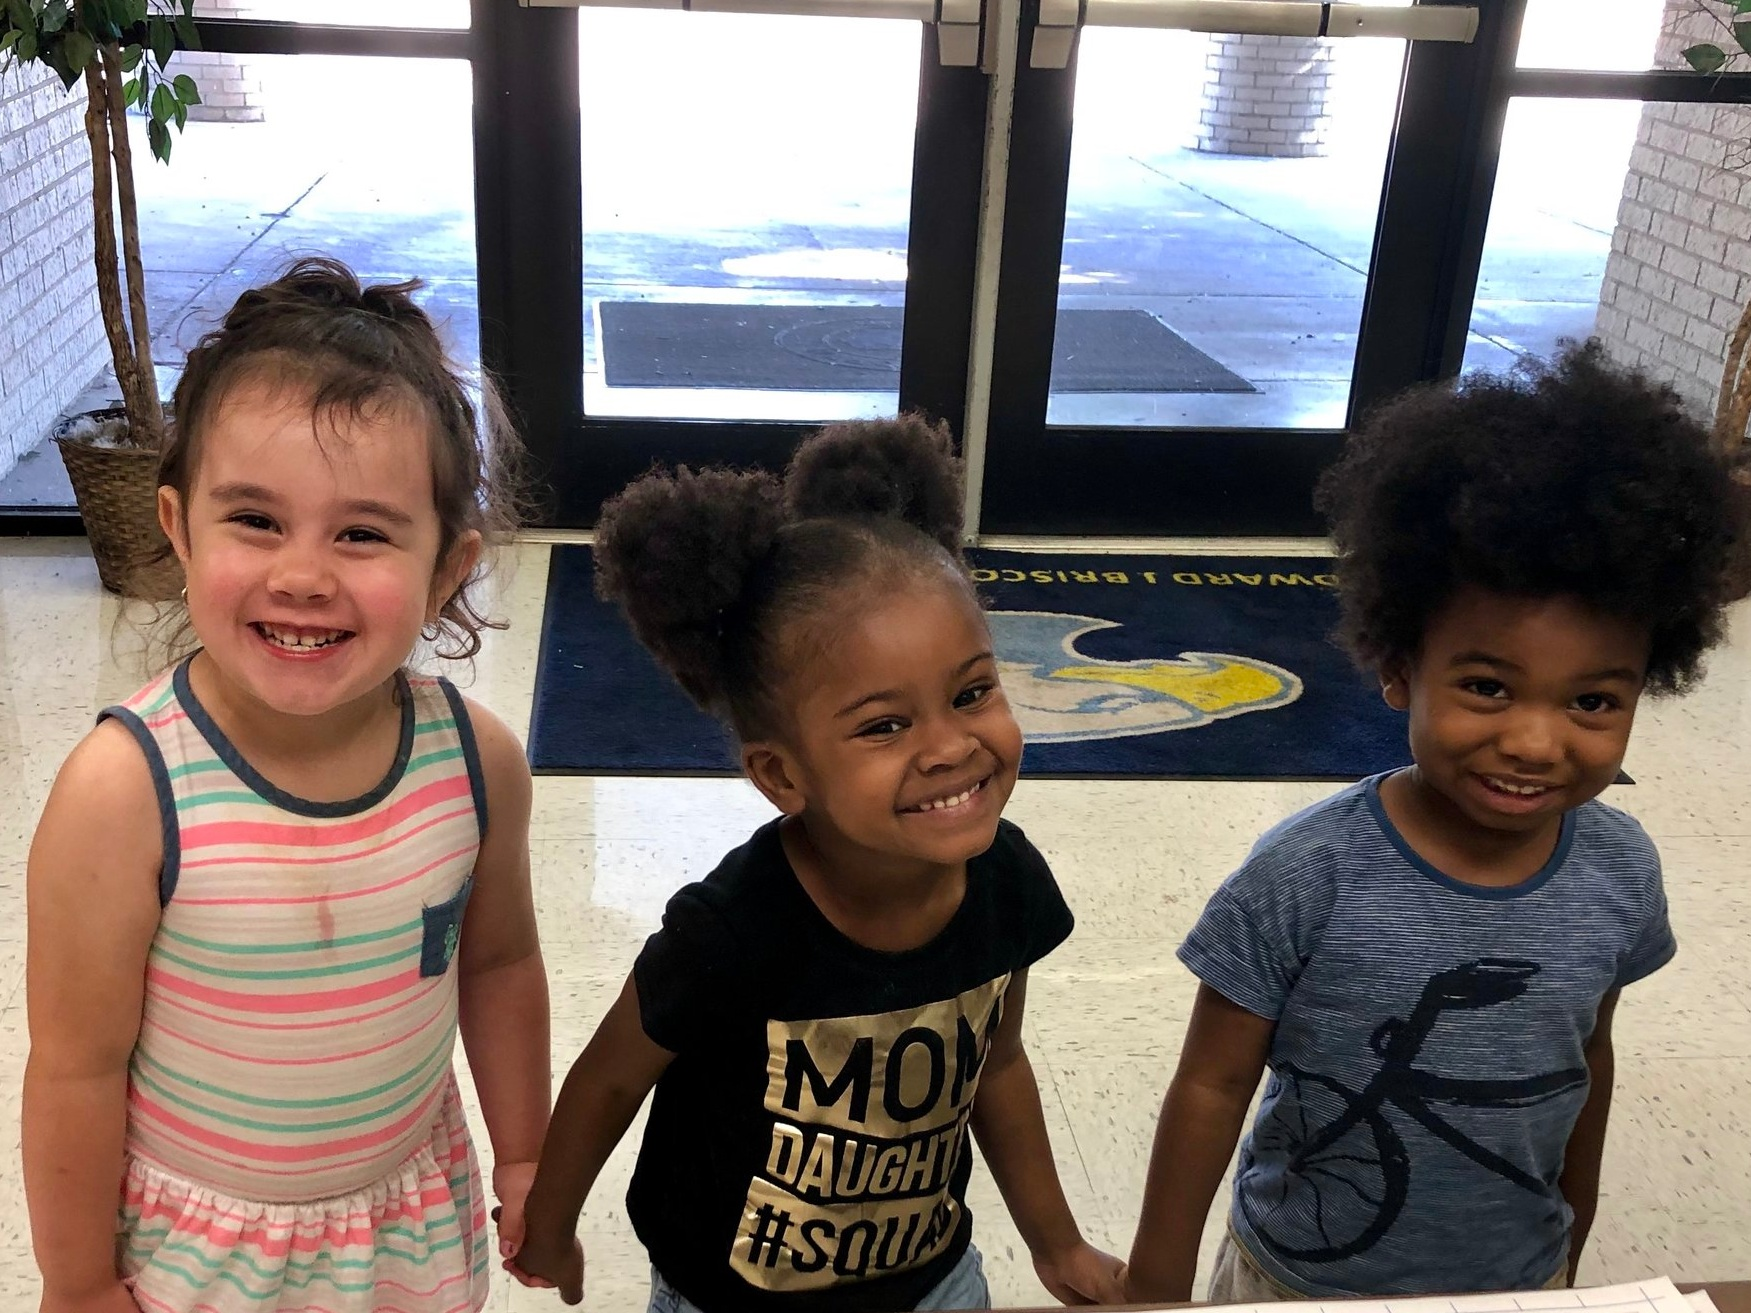 Summer Family Fun Night at Edward J. Briscoe Elementary